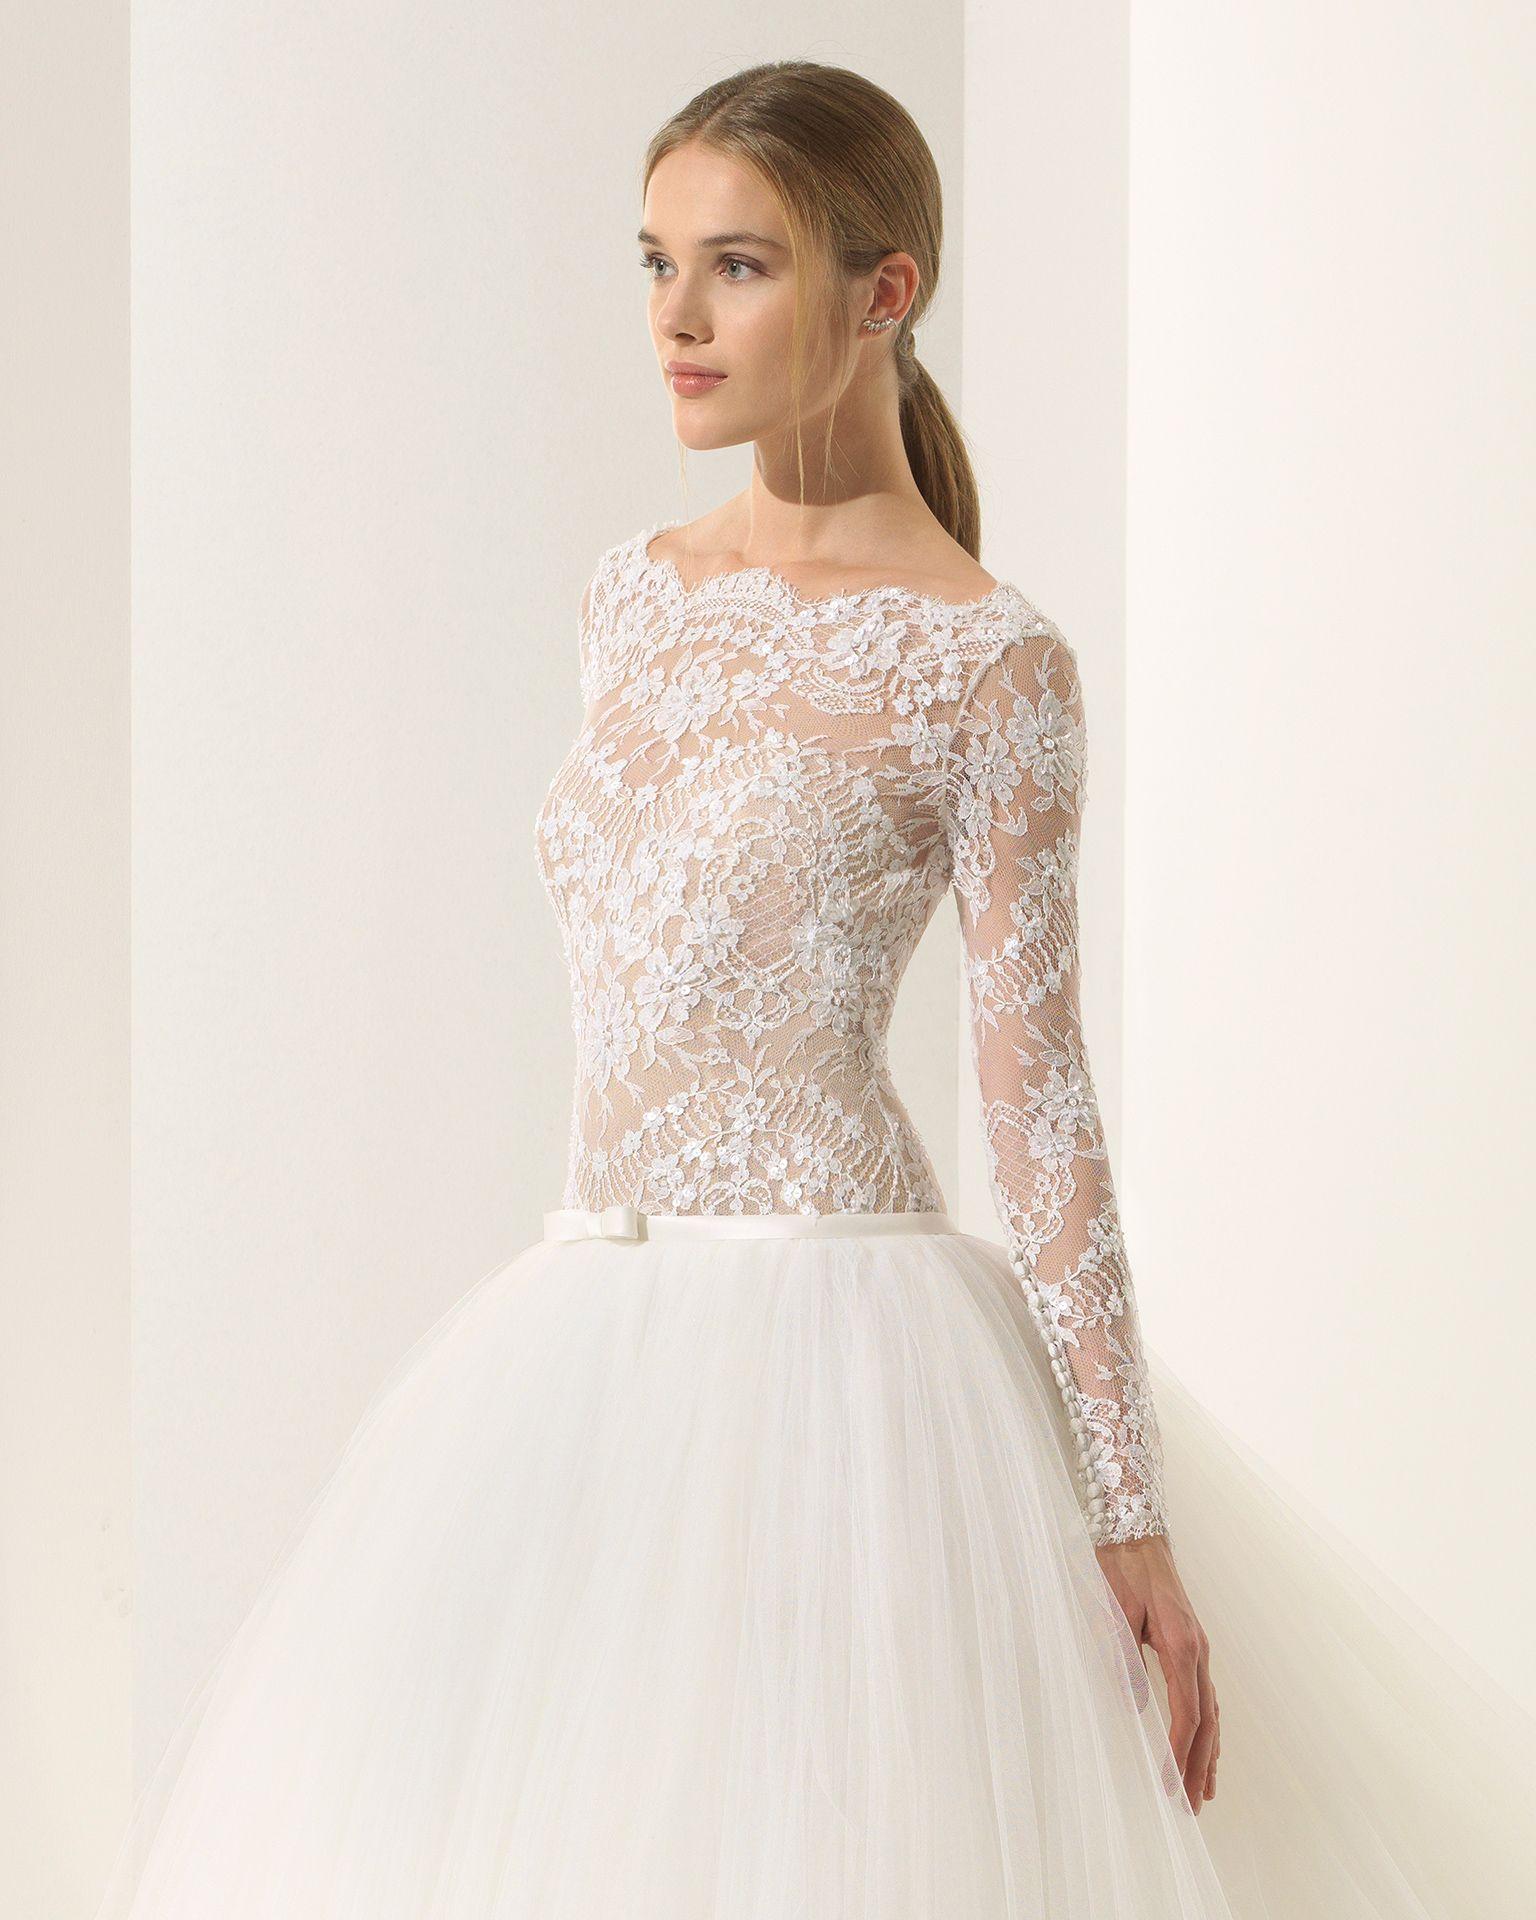 PARAISO - Hochzeit 2018. Kollektion Rosa Clará Couture | Princess ...